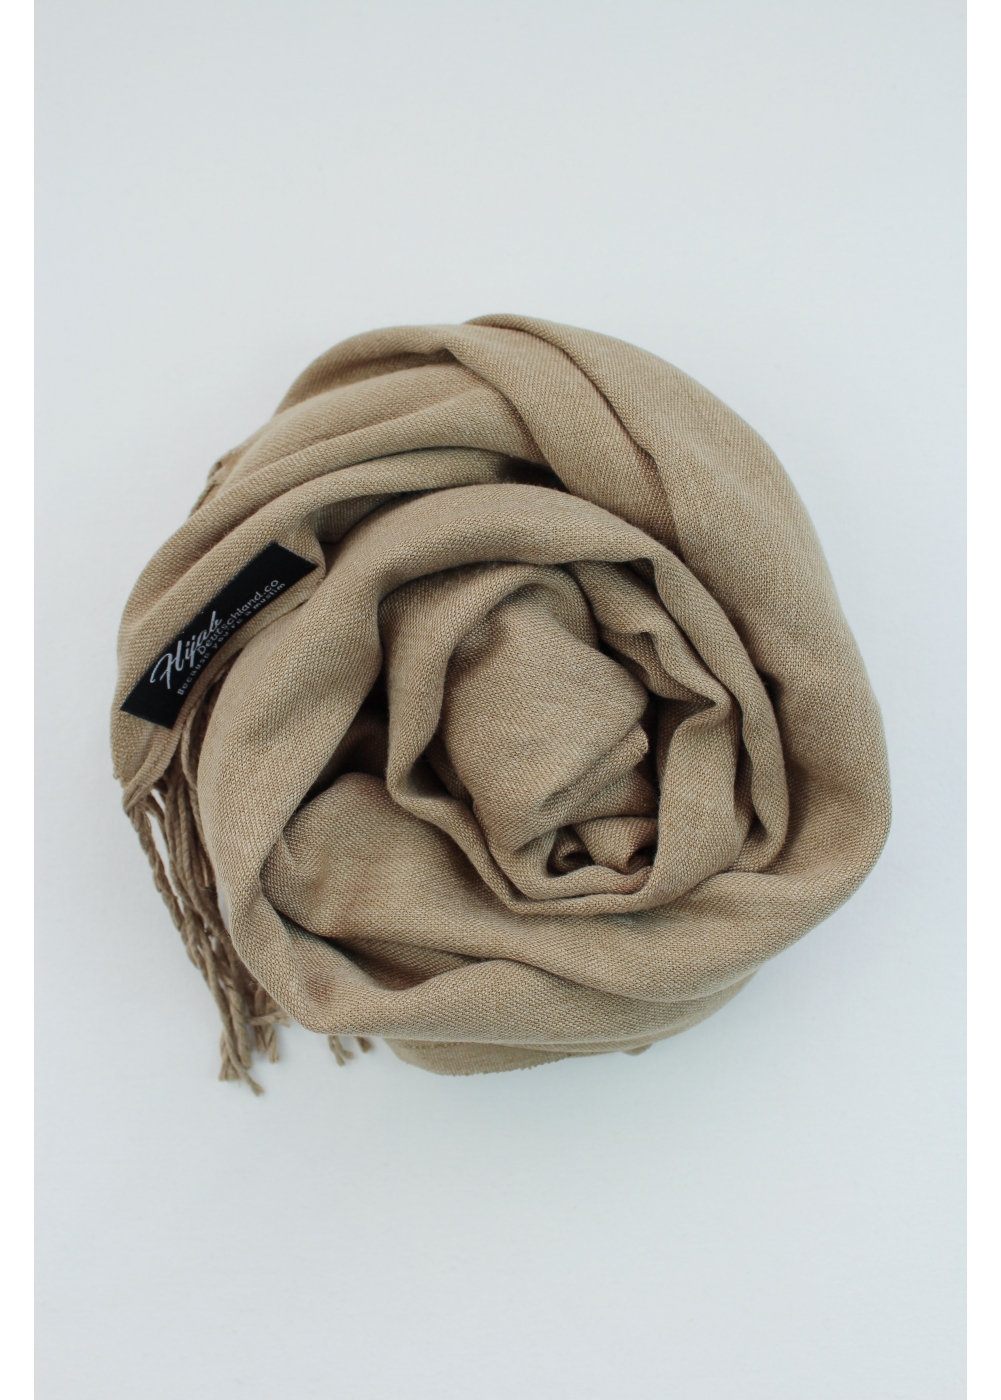 Pashmina hijab dusty beige